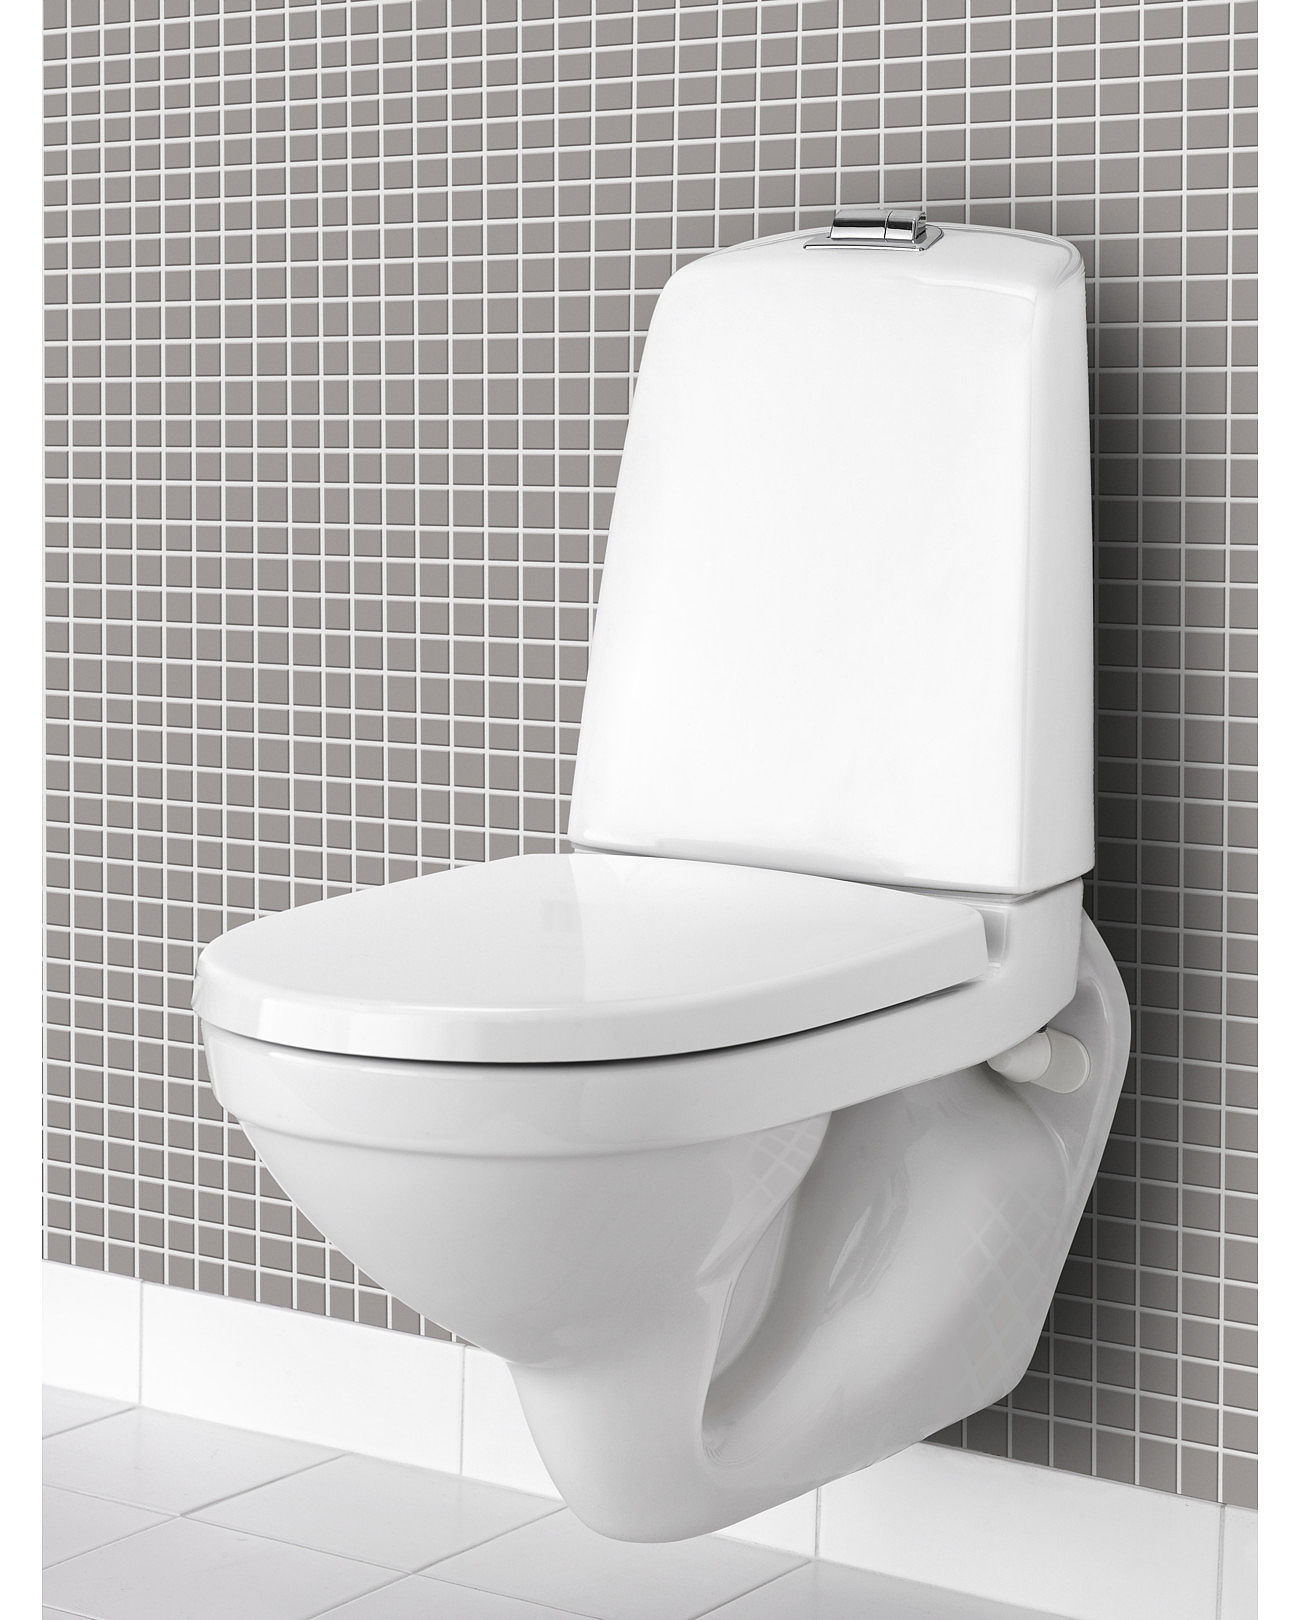 toilet_Nautic 1522